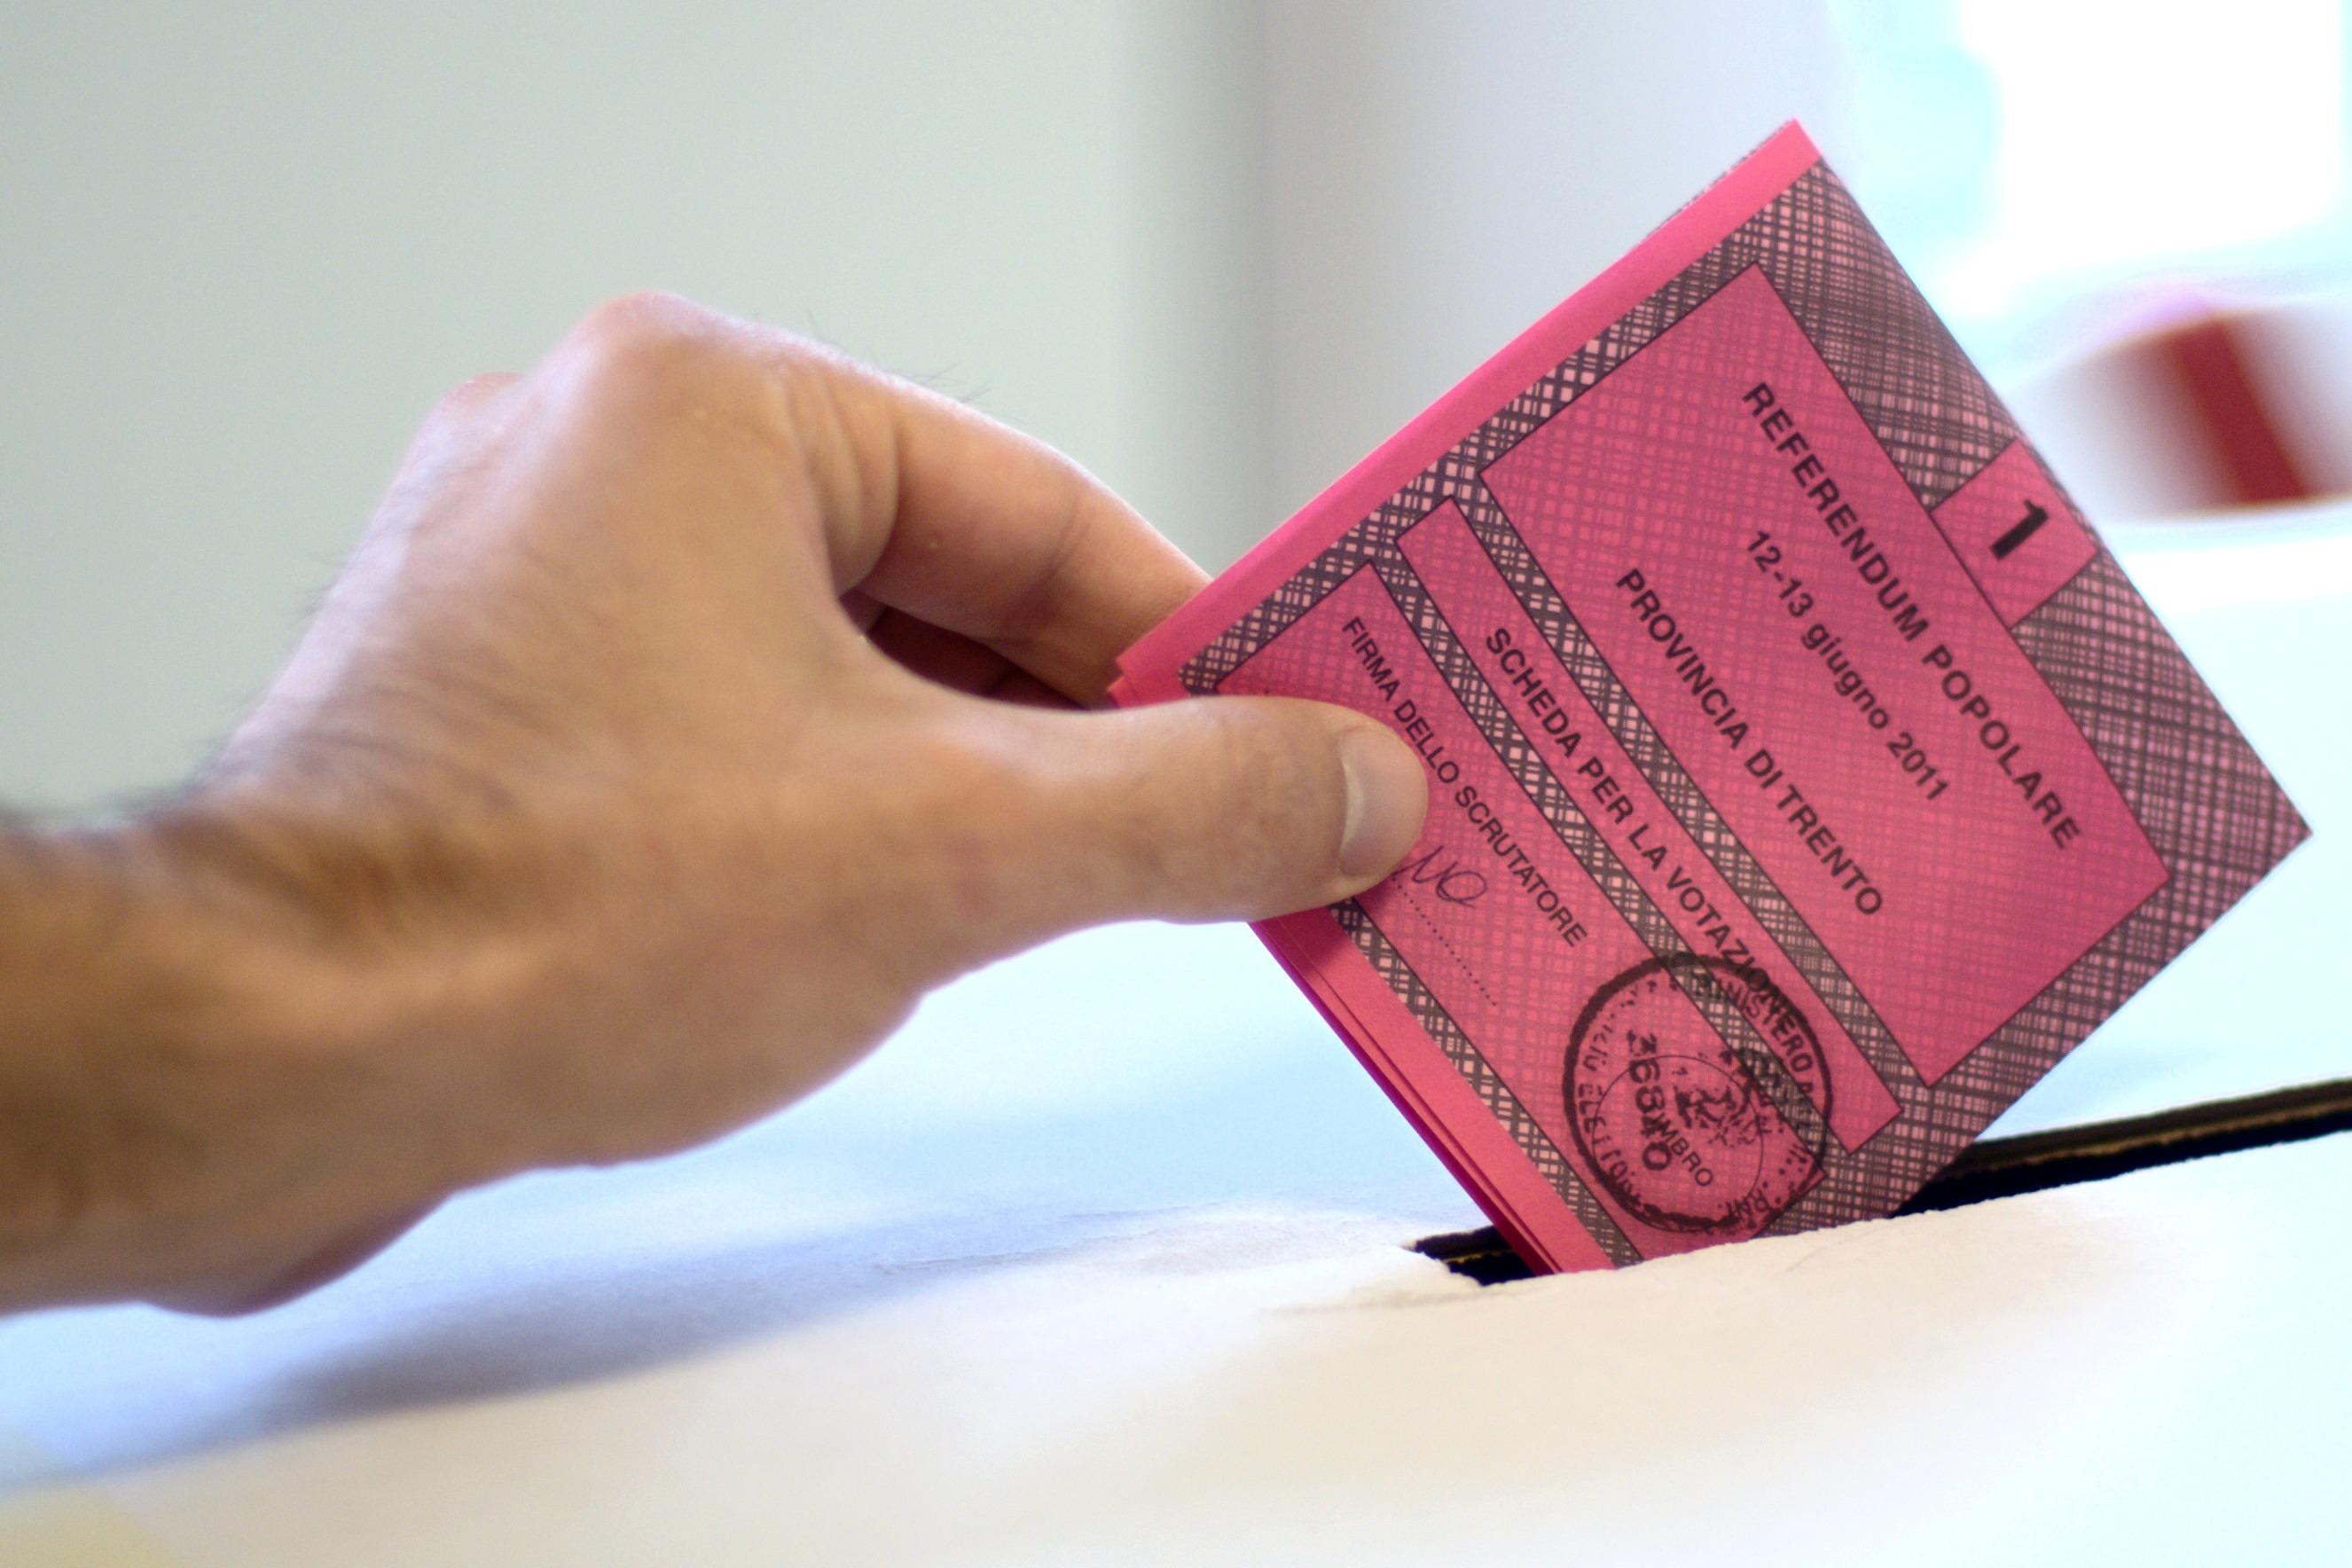 sistema elettorale tedesco